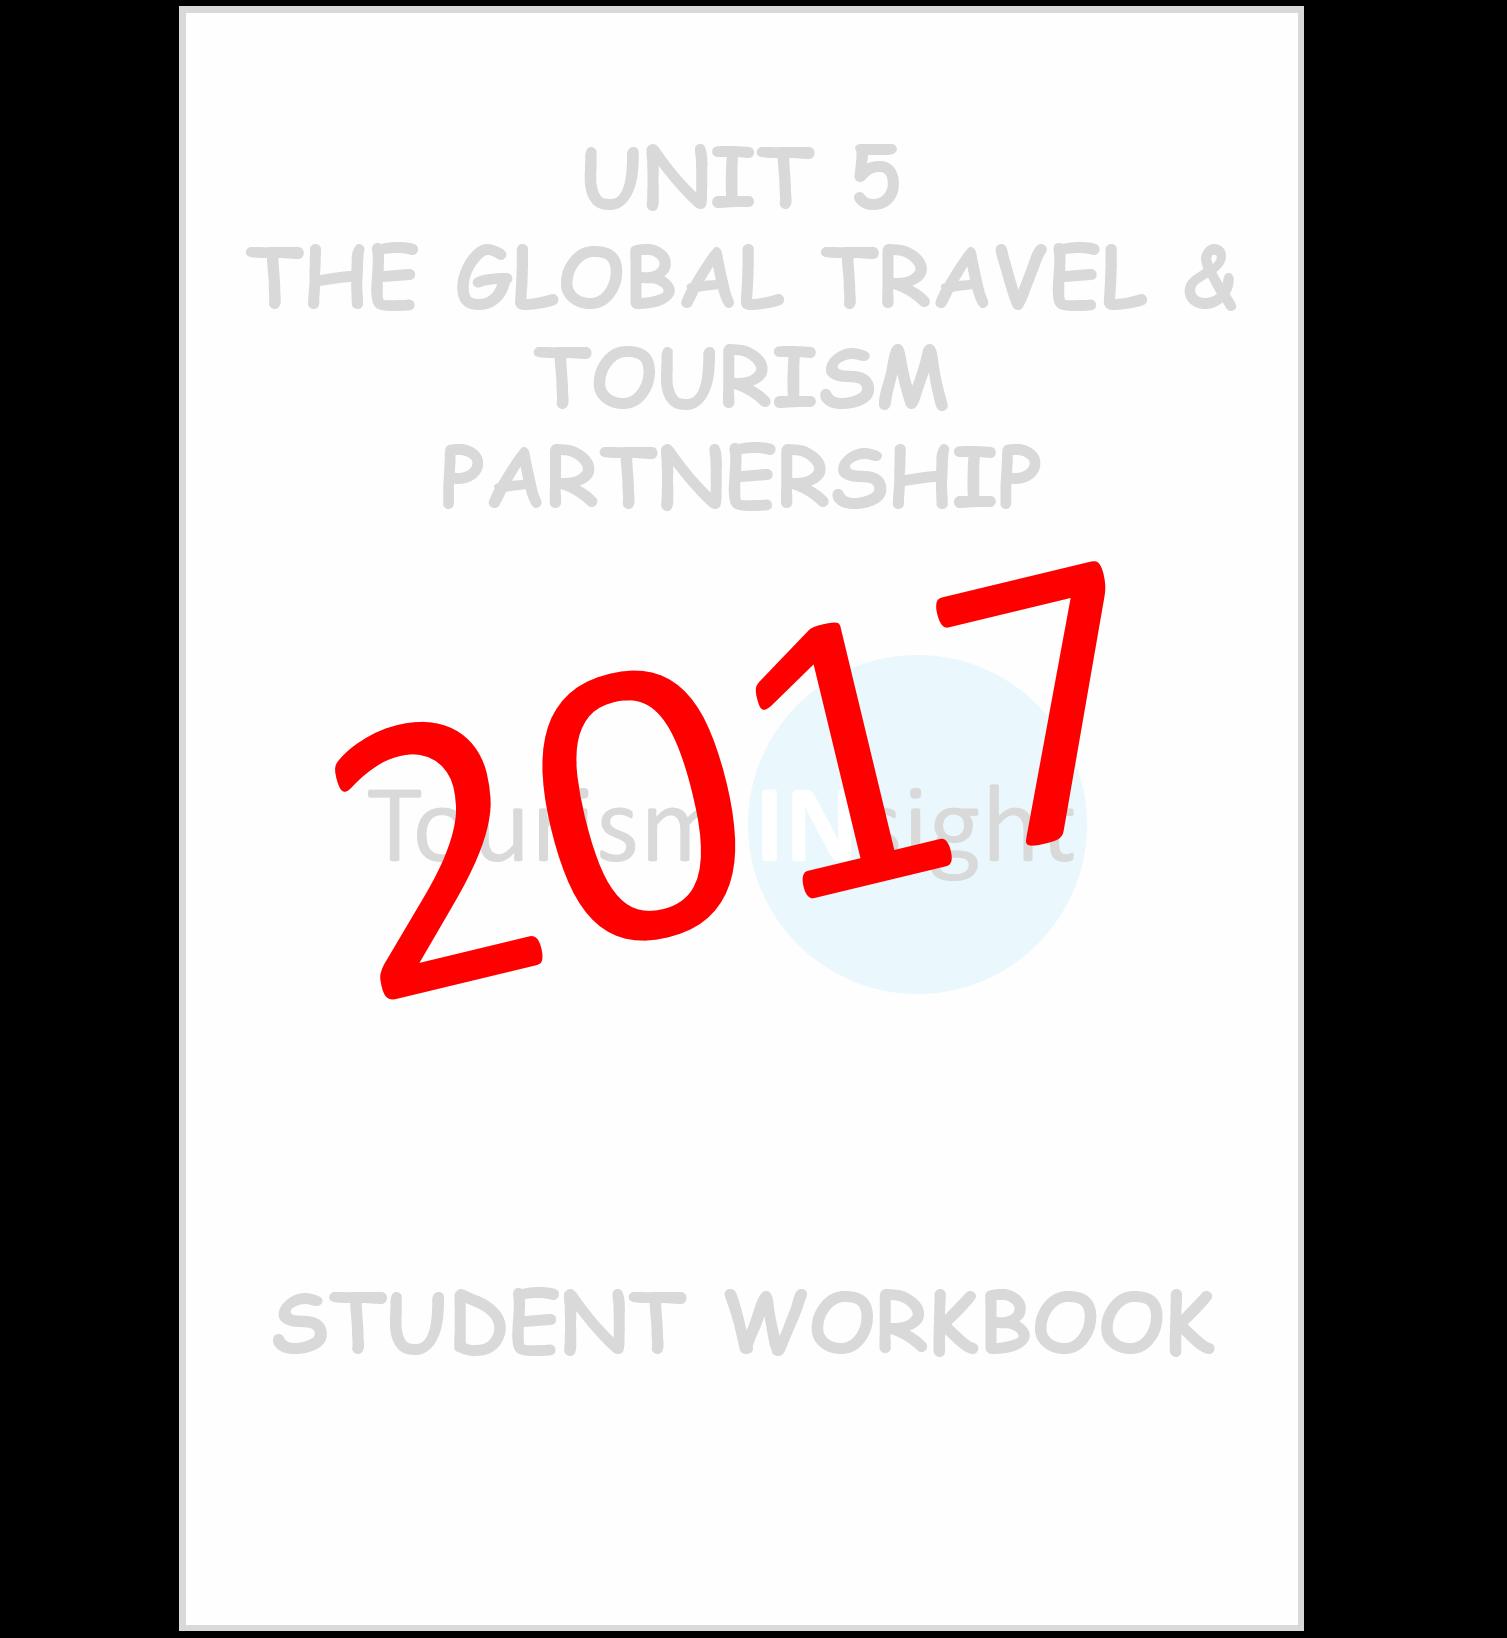 unit-5-2017-workbook